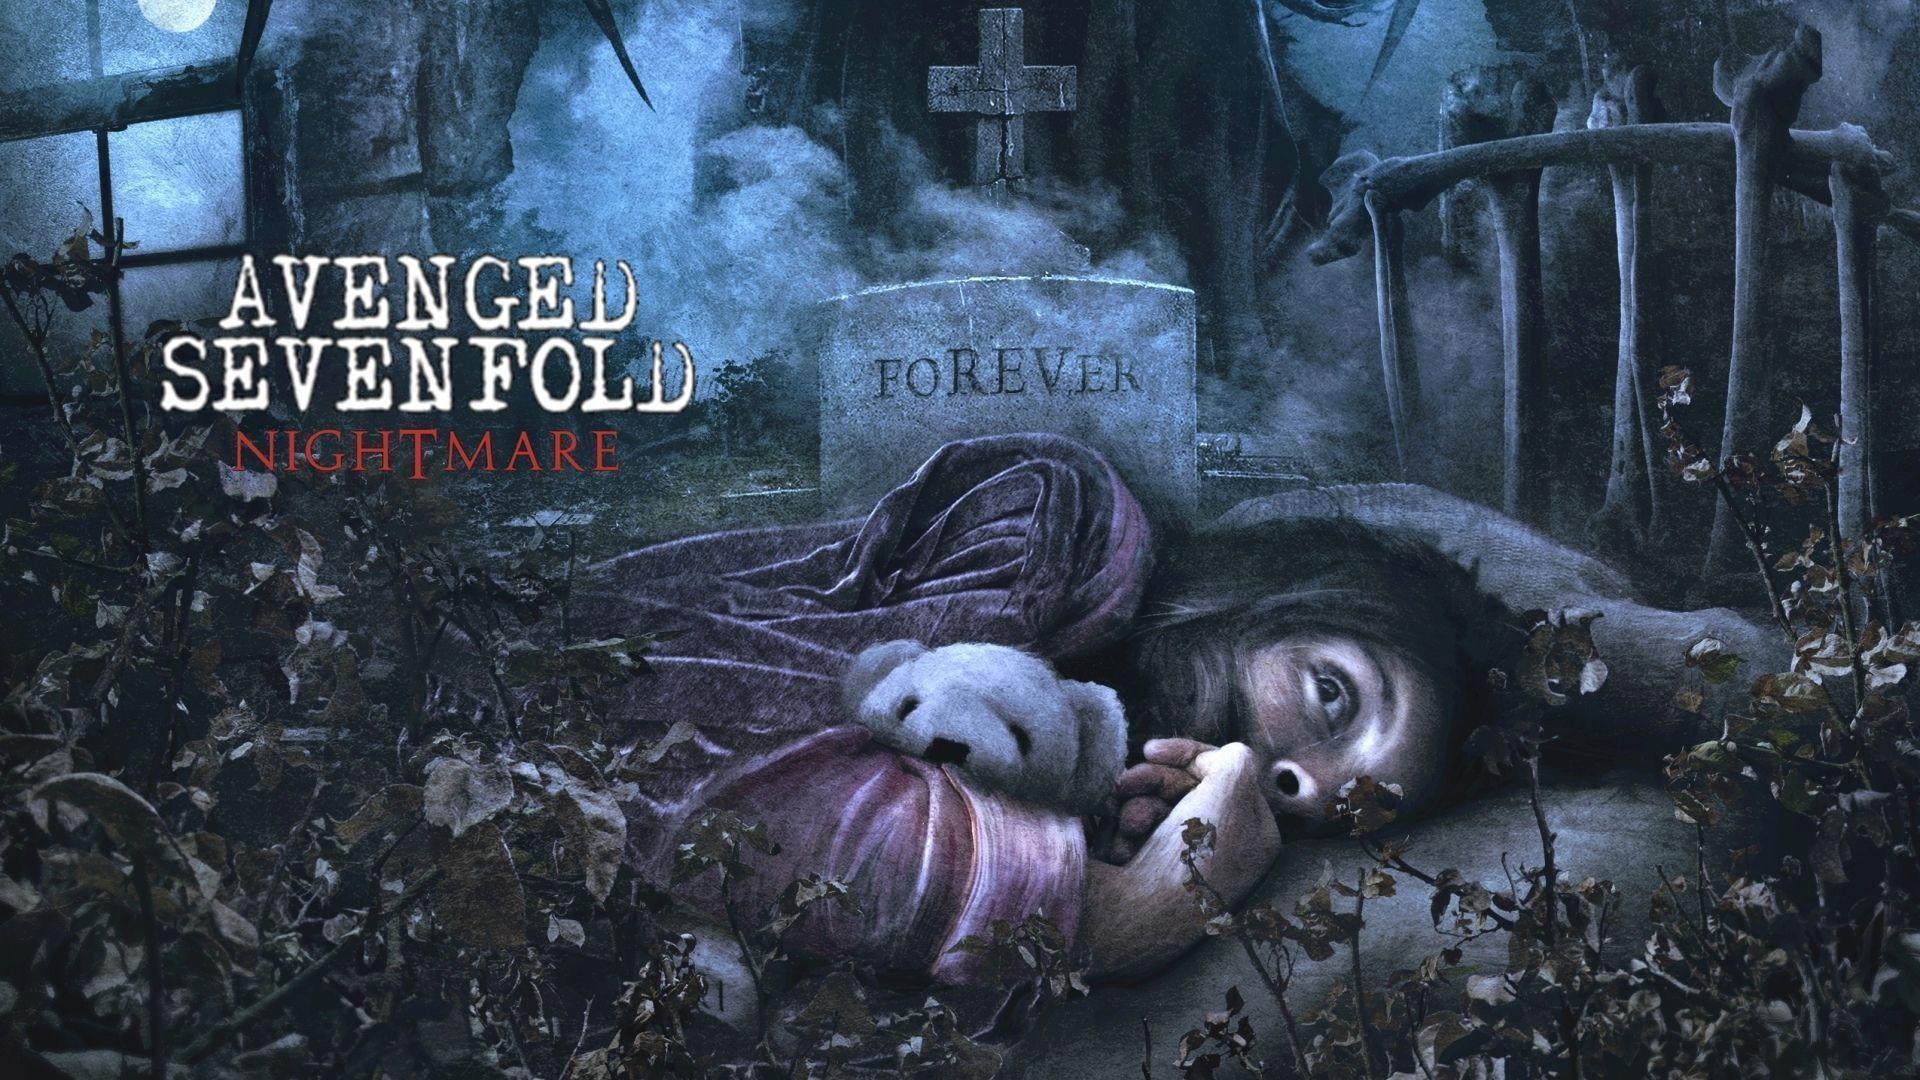 Avenged Sevenfold Wallpaper Hd